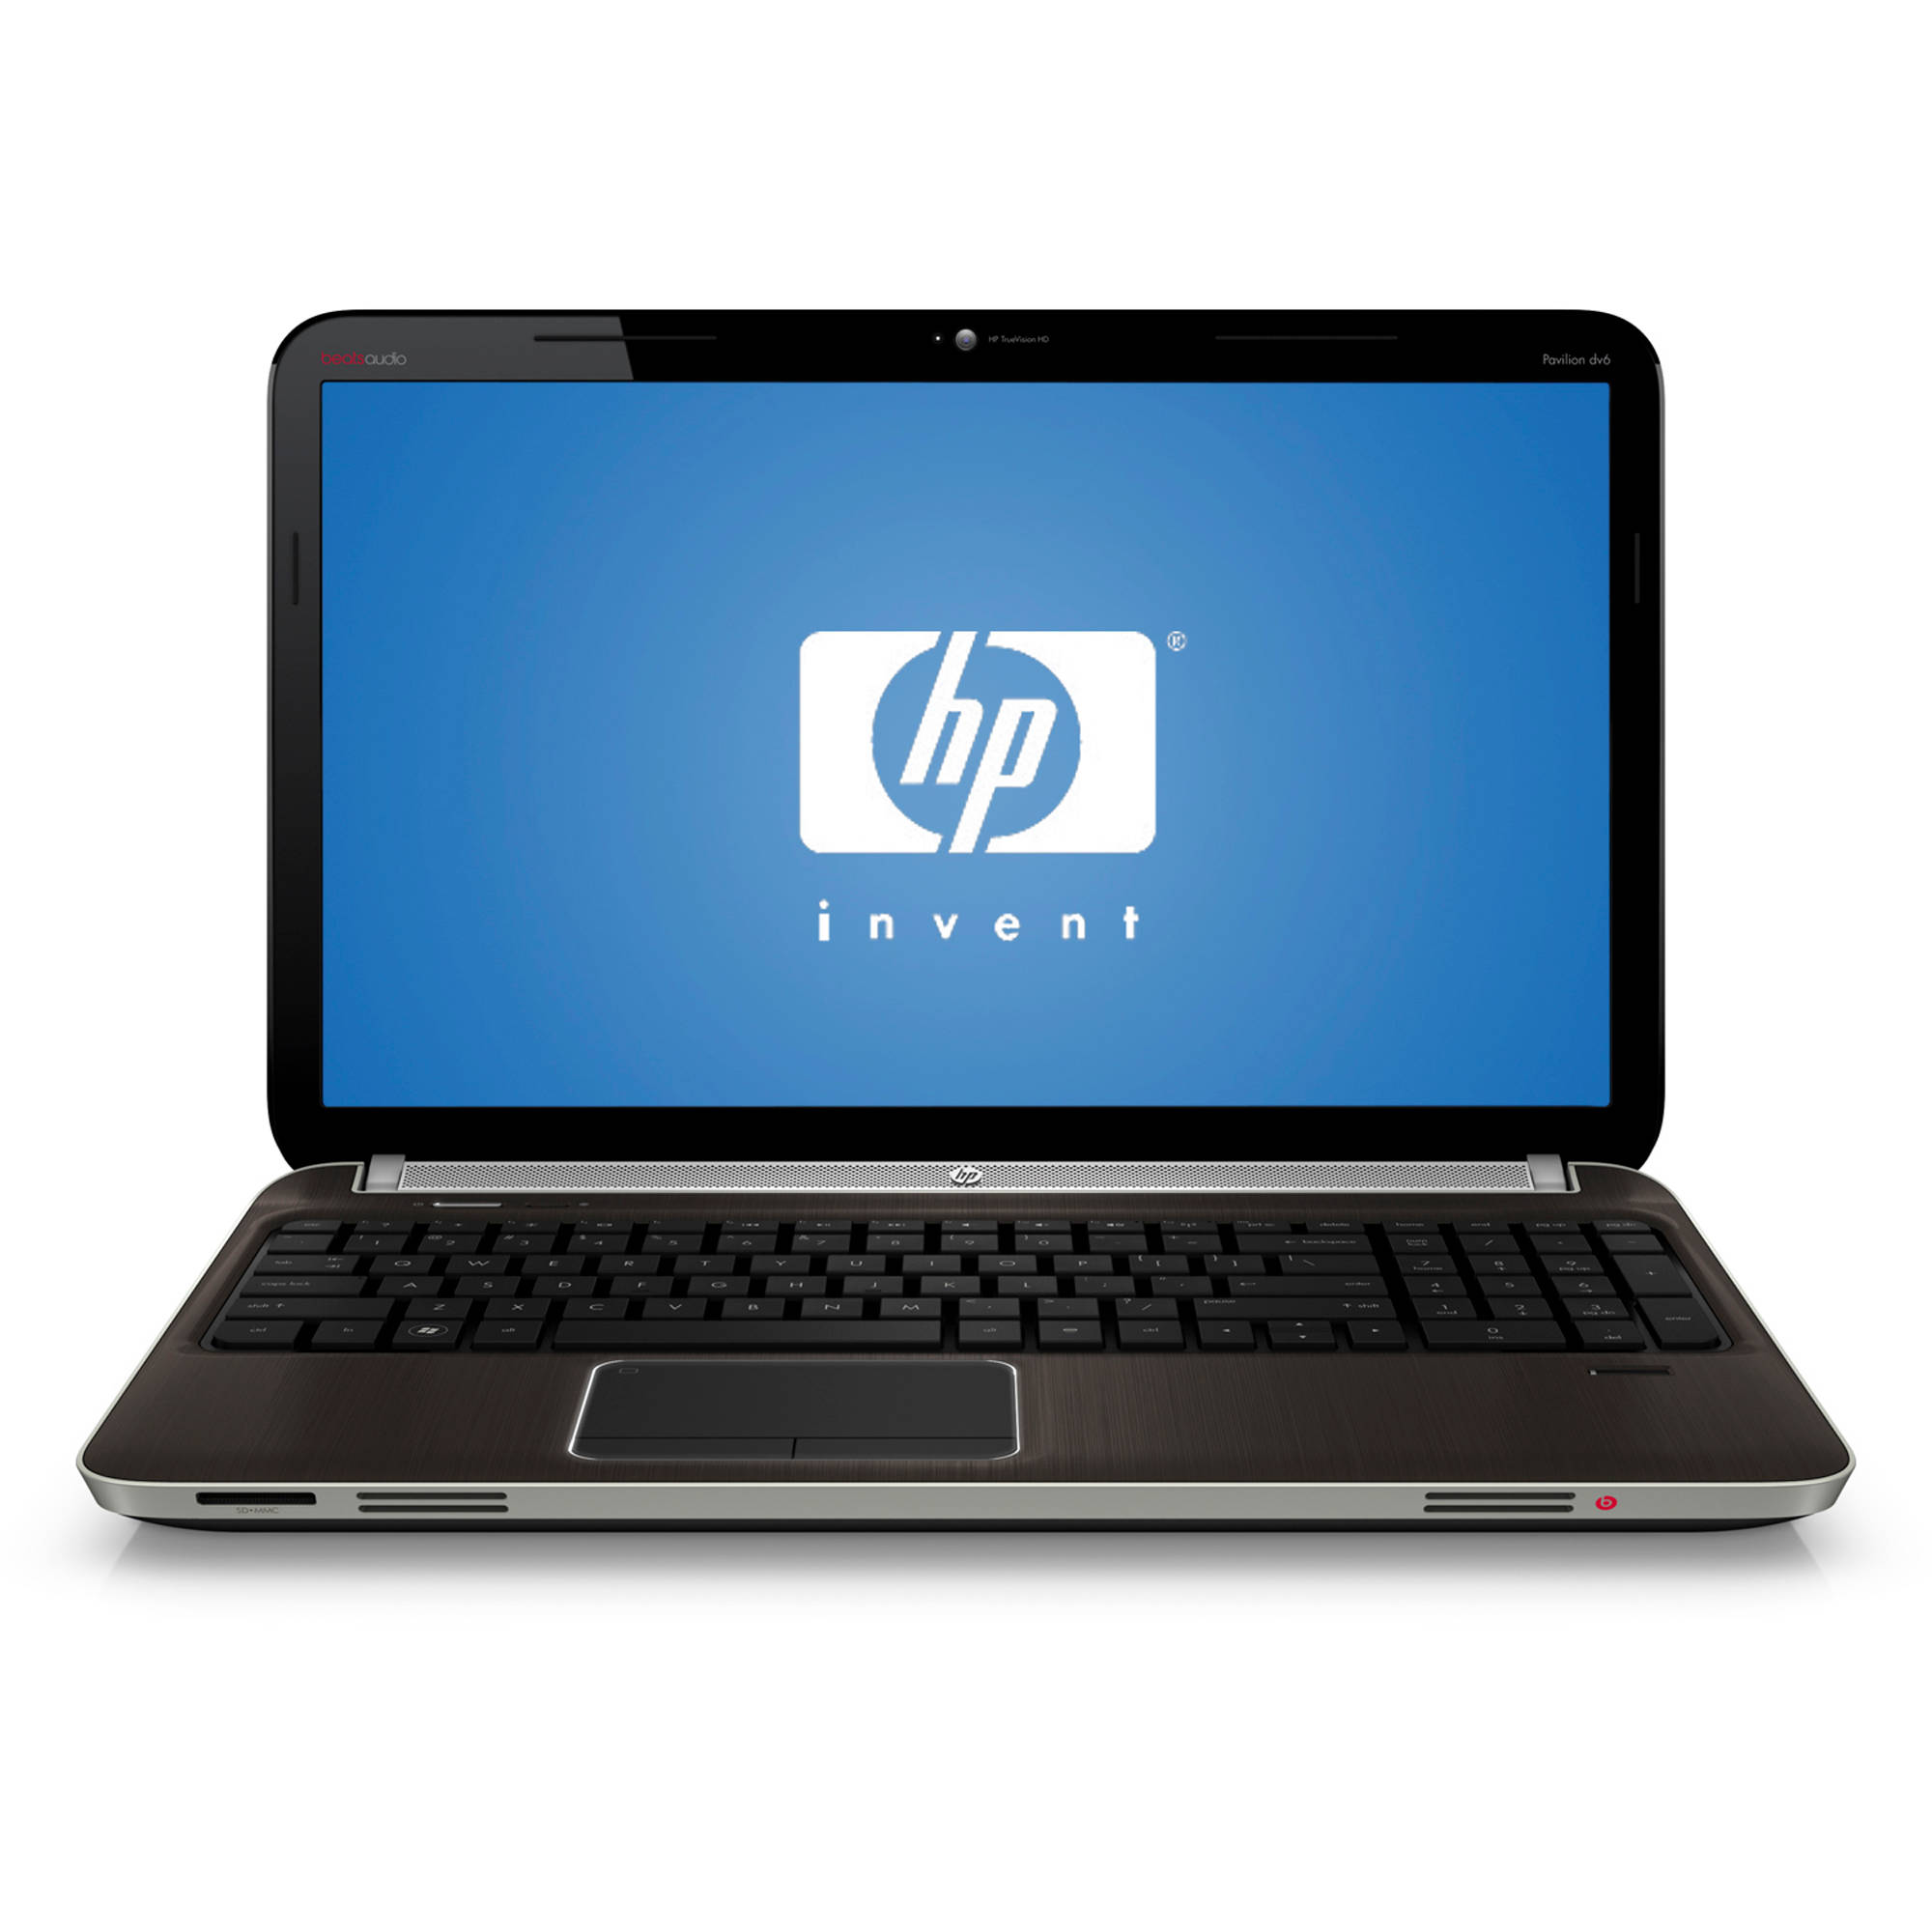 "Hewlett Packard Hp Pavilion Dv6-6047cl 15.6"" Laptop ..."